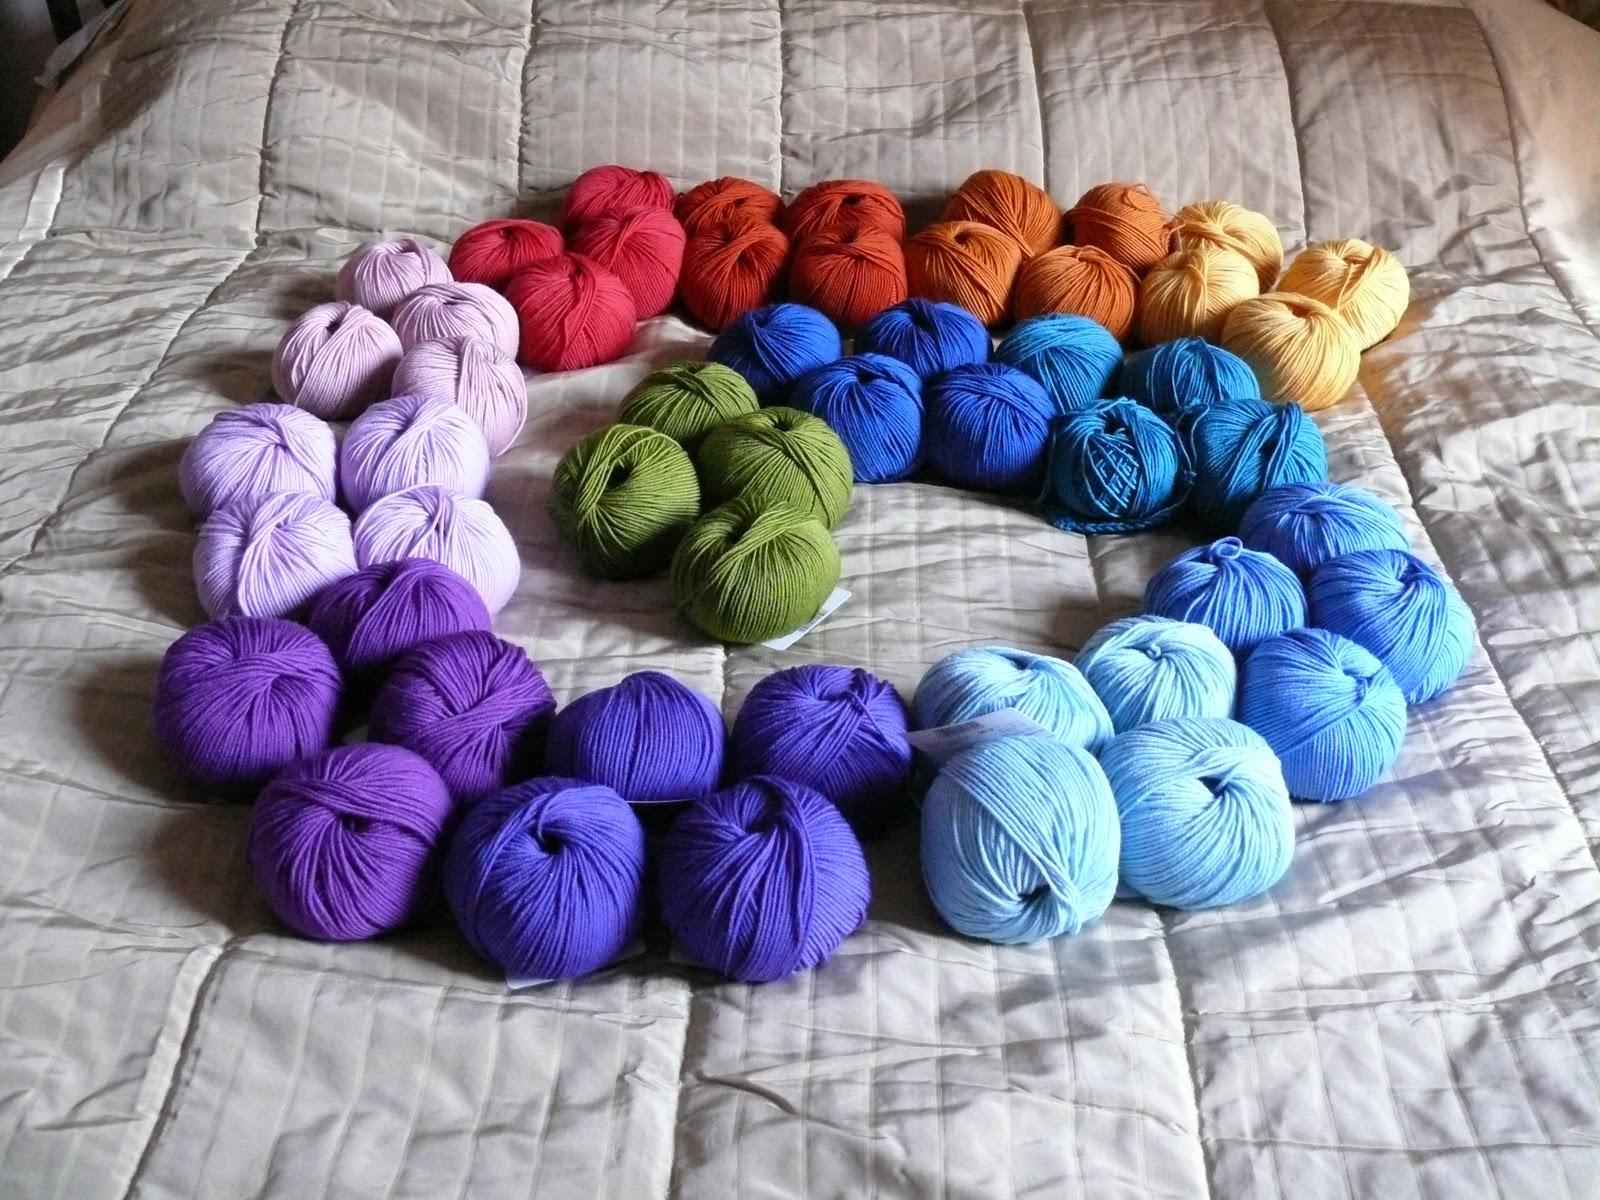 Seconda coperta patchwork all'uncinetto Lana+4-+arcobaleno